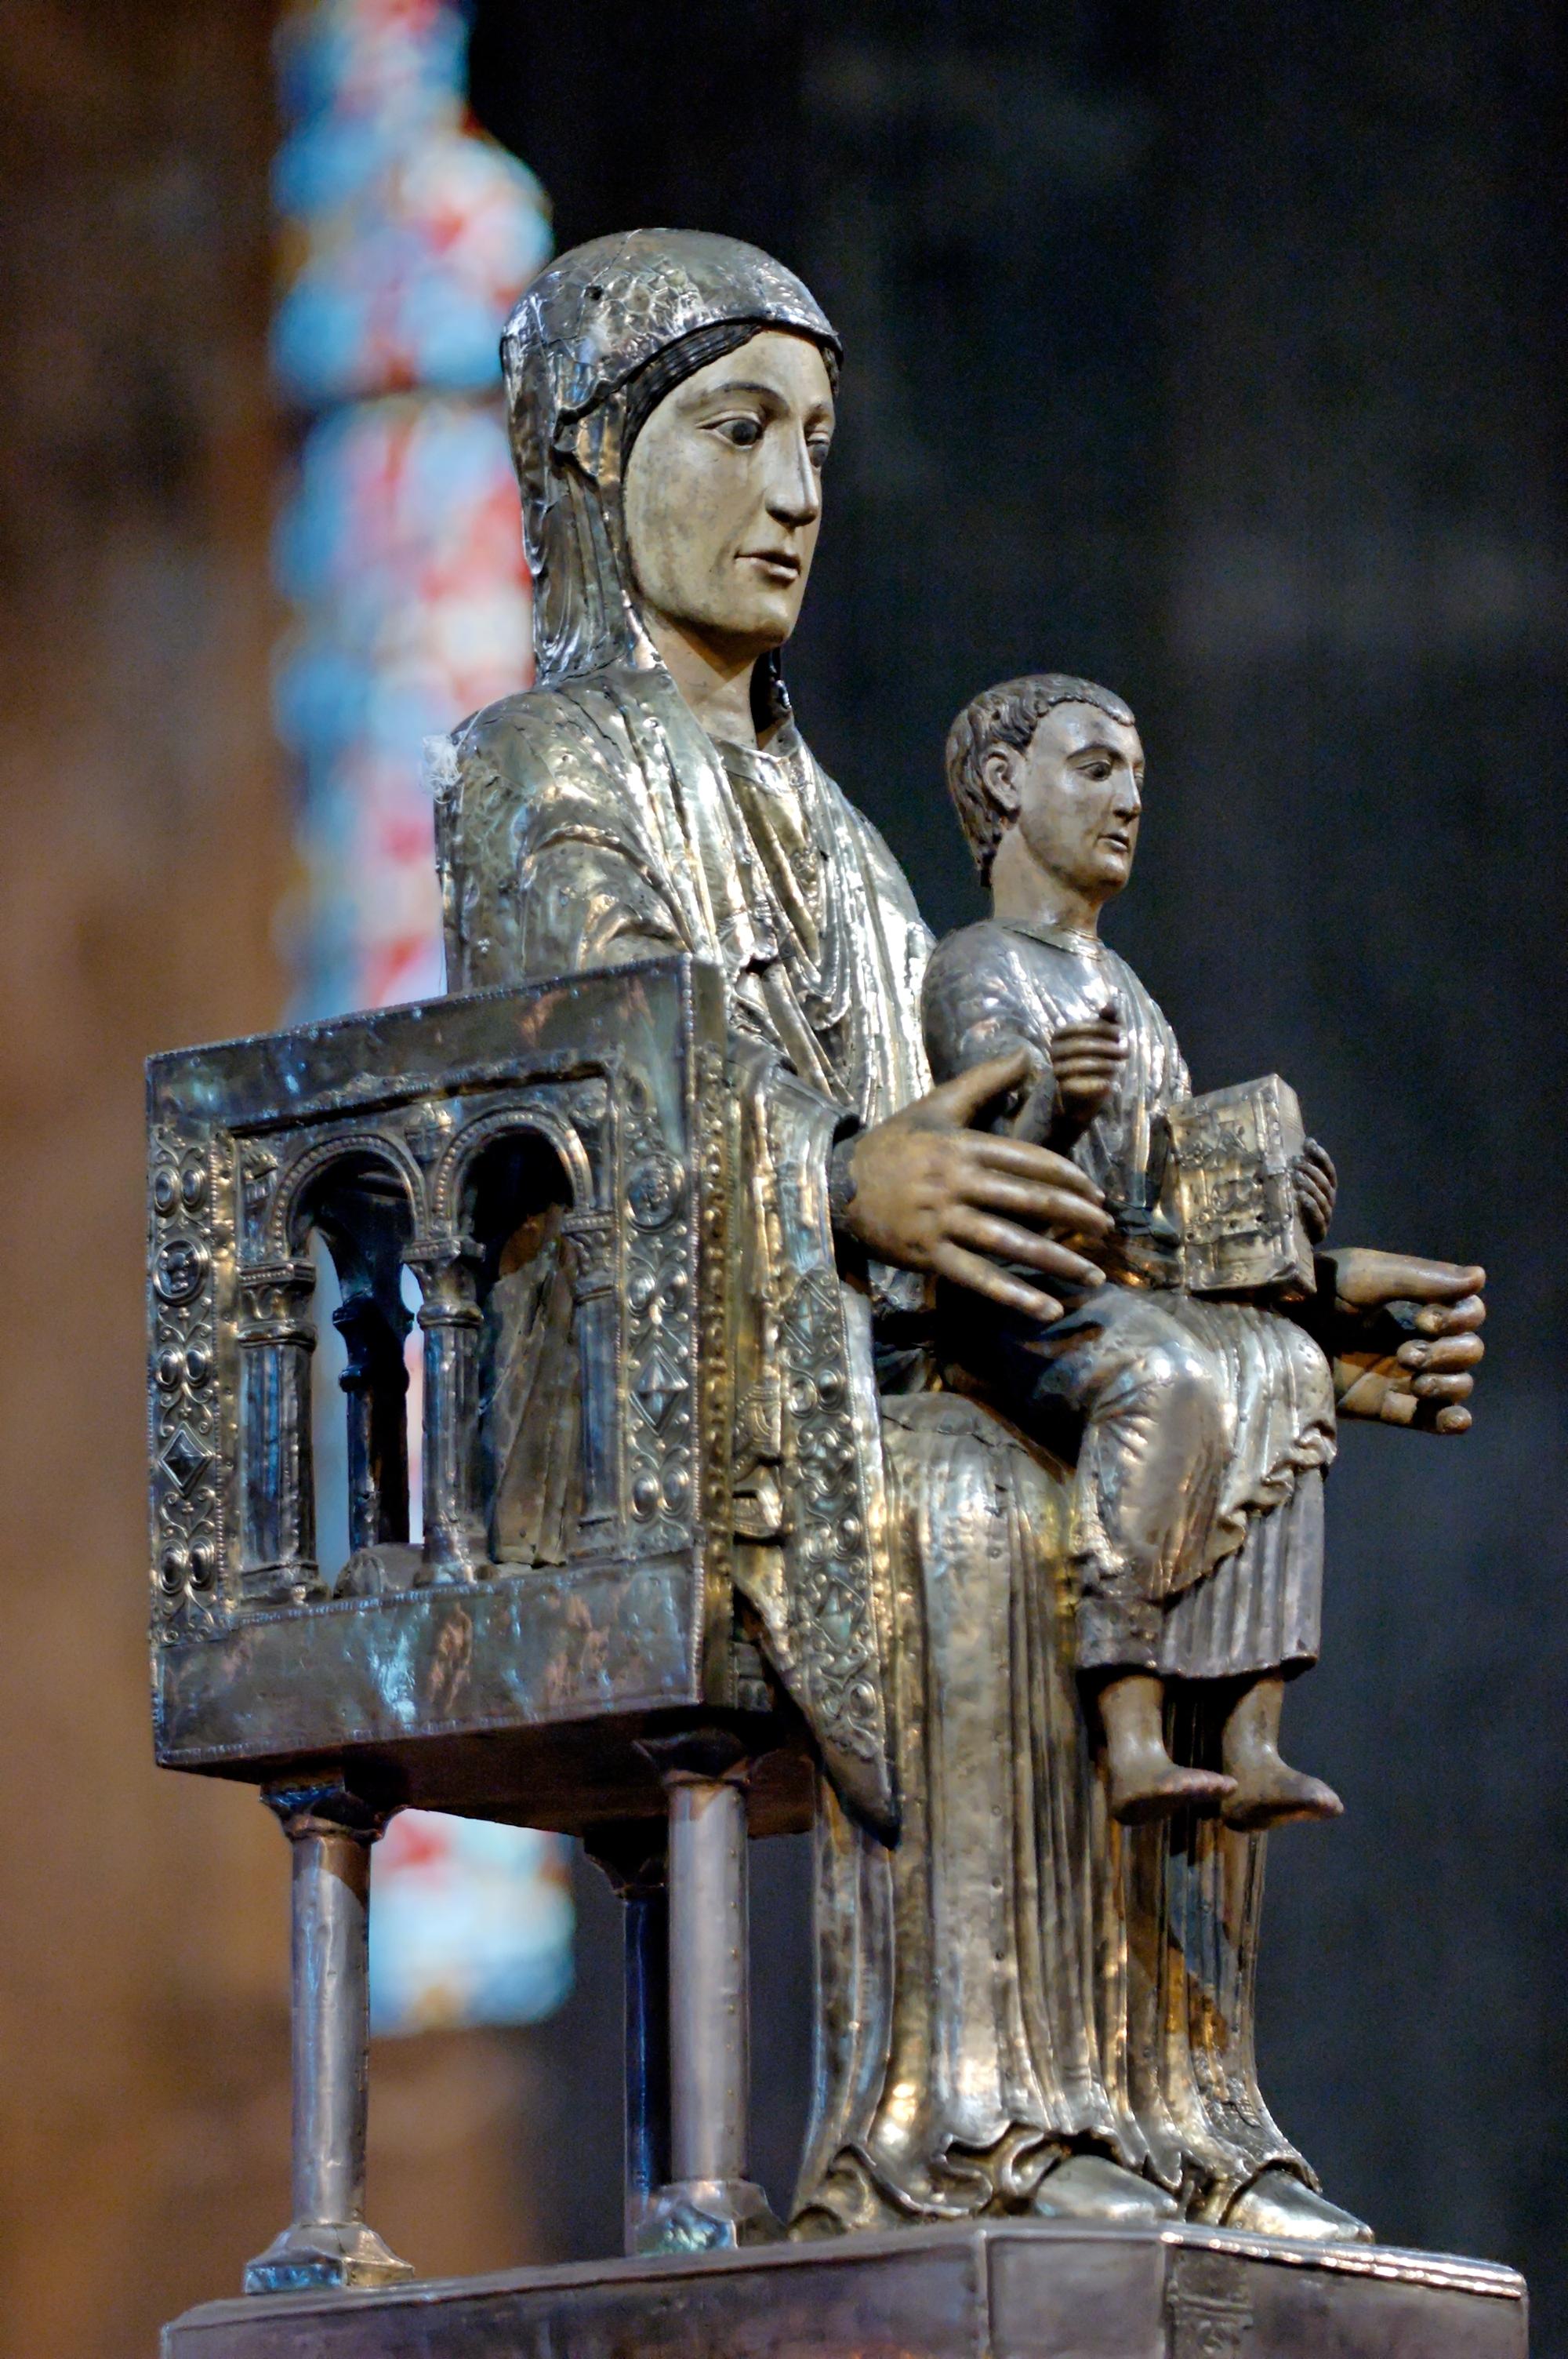 Seat of Wisdom Statue Virgin as Seat of Wisdom